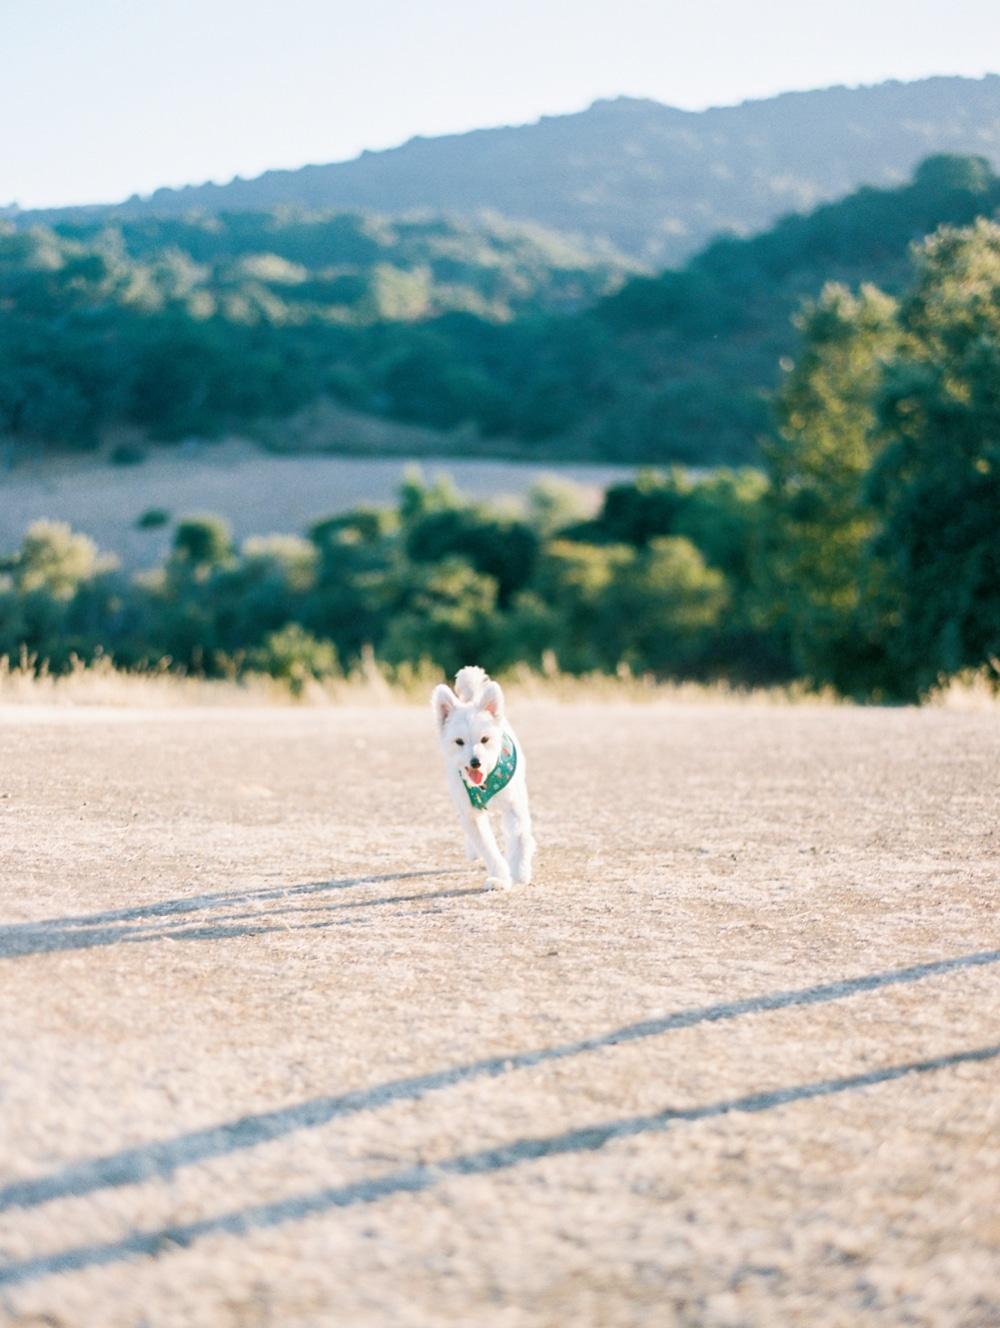 Kristin-La-Voie-Photography-california-wedding-photographer-dog-session-rancho-san-antonio-los-altos-33